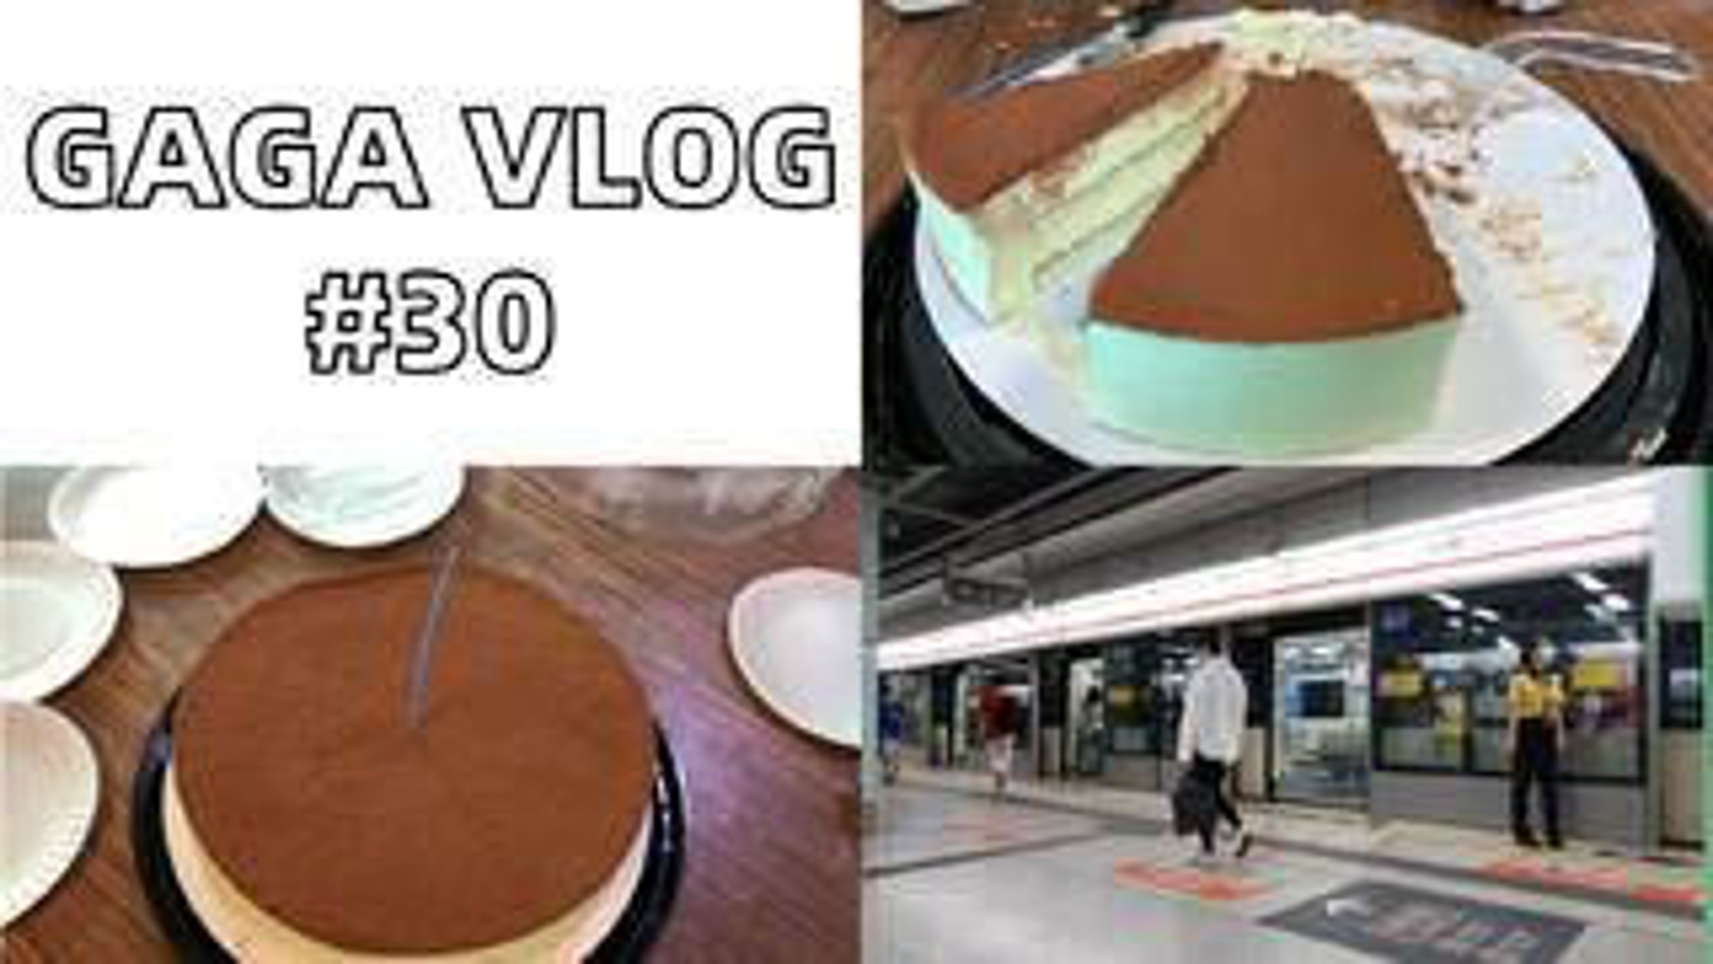 【DailyVlog.24】祝我生日快乐 我对节日的看法 GAGAVLOG#30